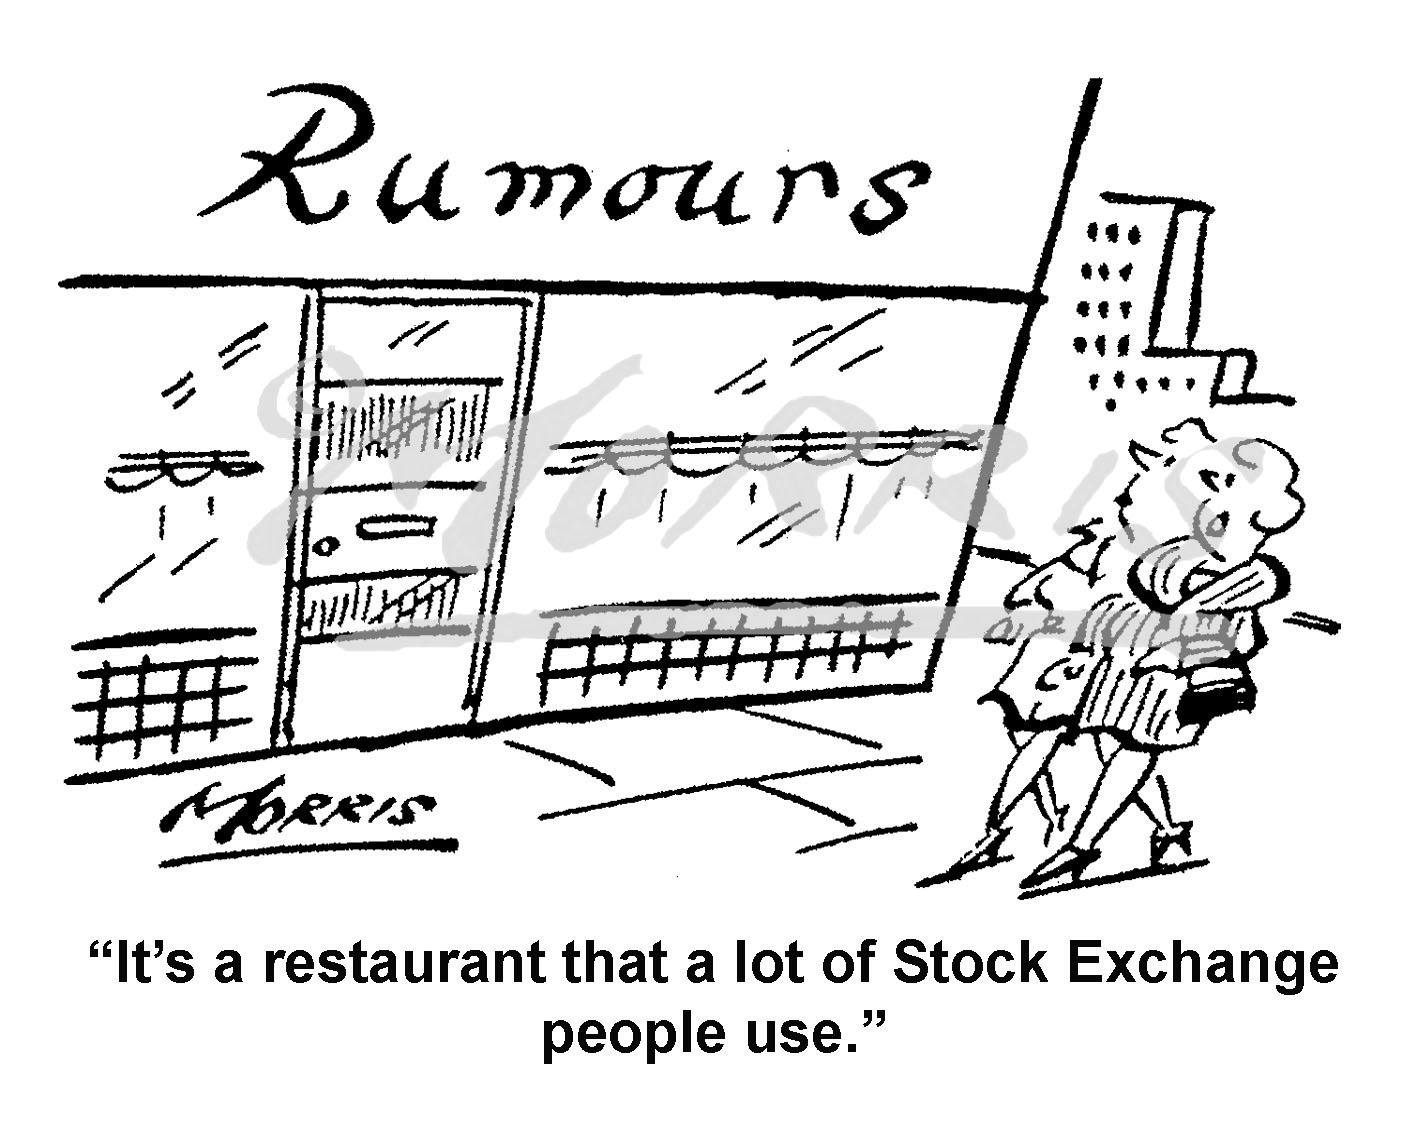 Stock Exchange cartoon – Ref: 5130bw